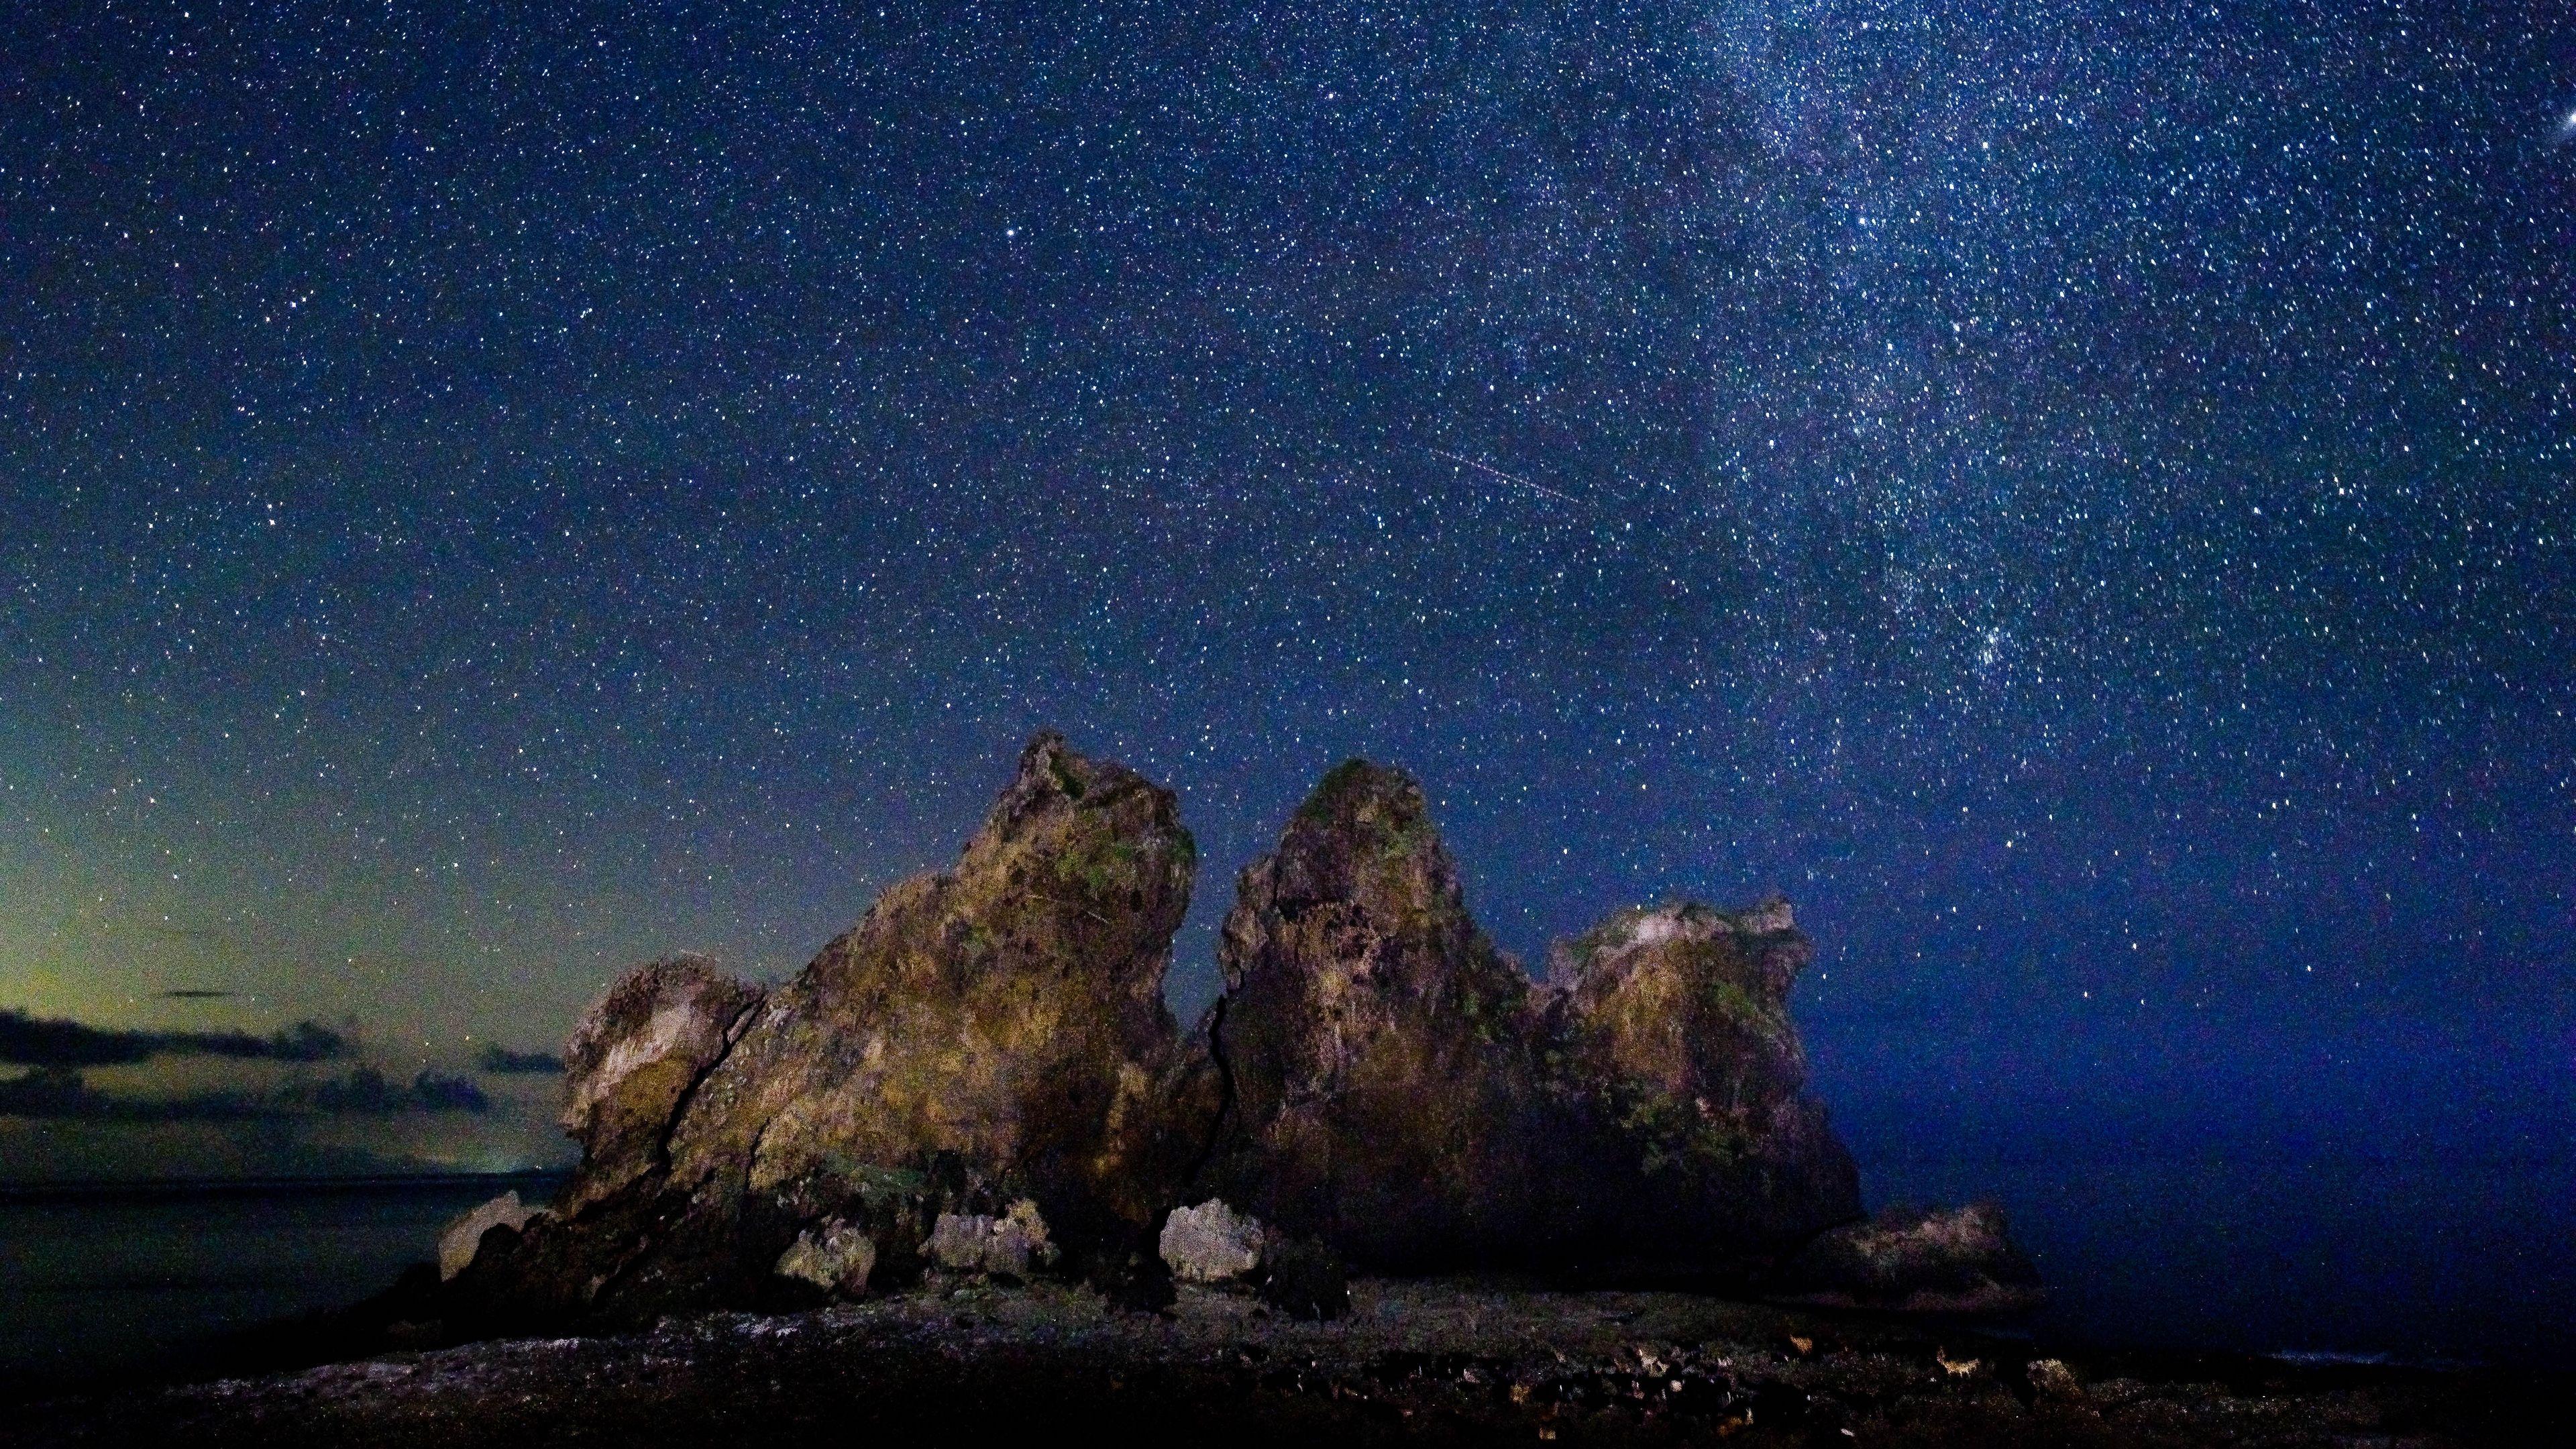 Starry Sky Milky Way Stars Rocks 4k Stars Starry Sky Milky Way Starry Sky Milky Way Sky